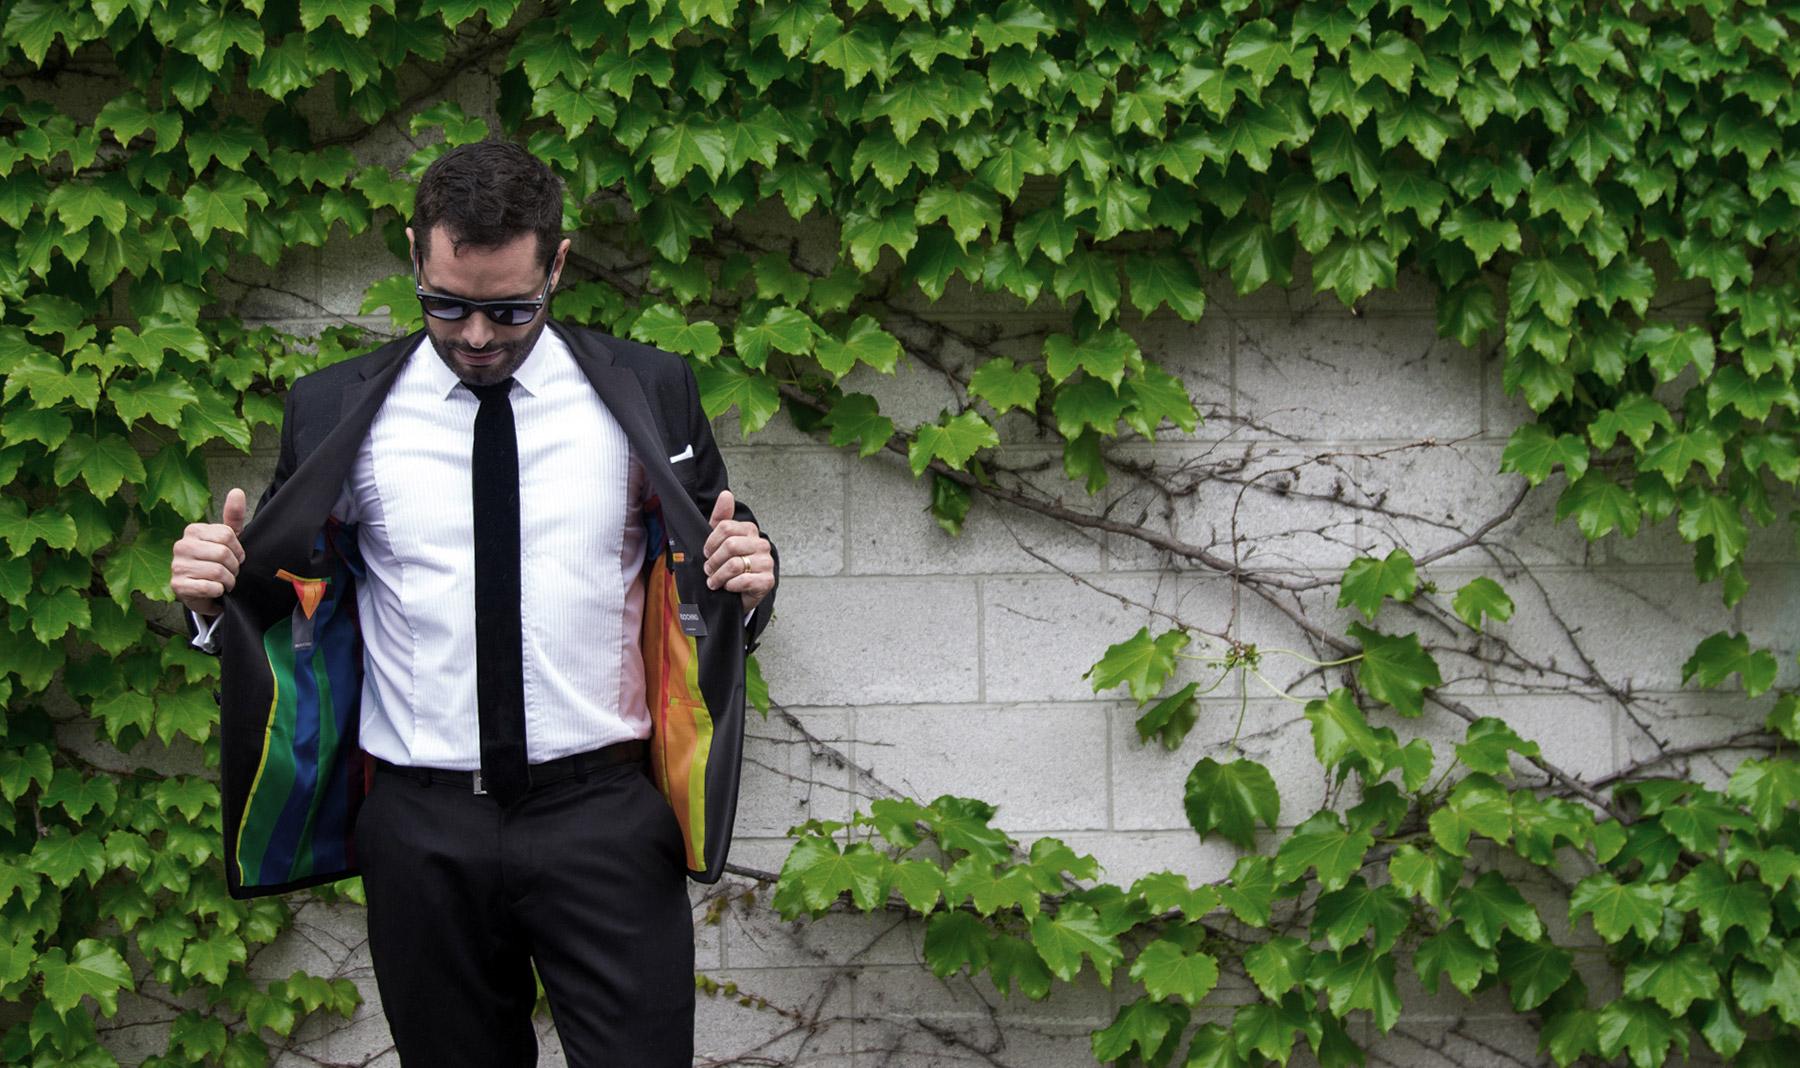 Mathieu Chantelois - pride suit lining